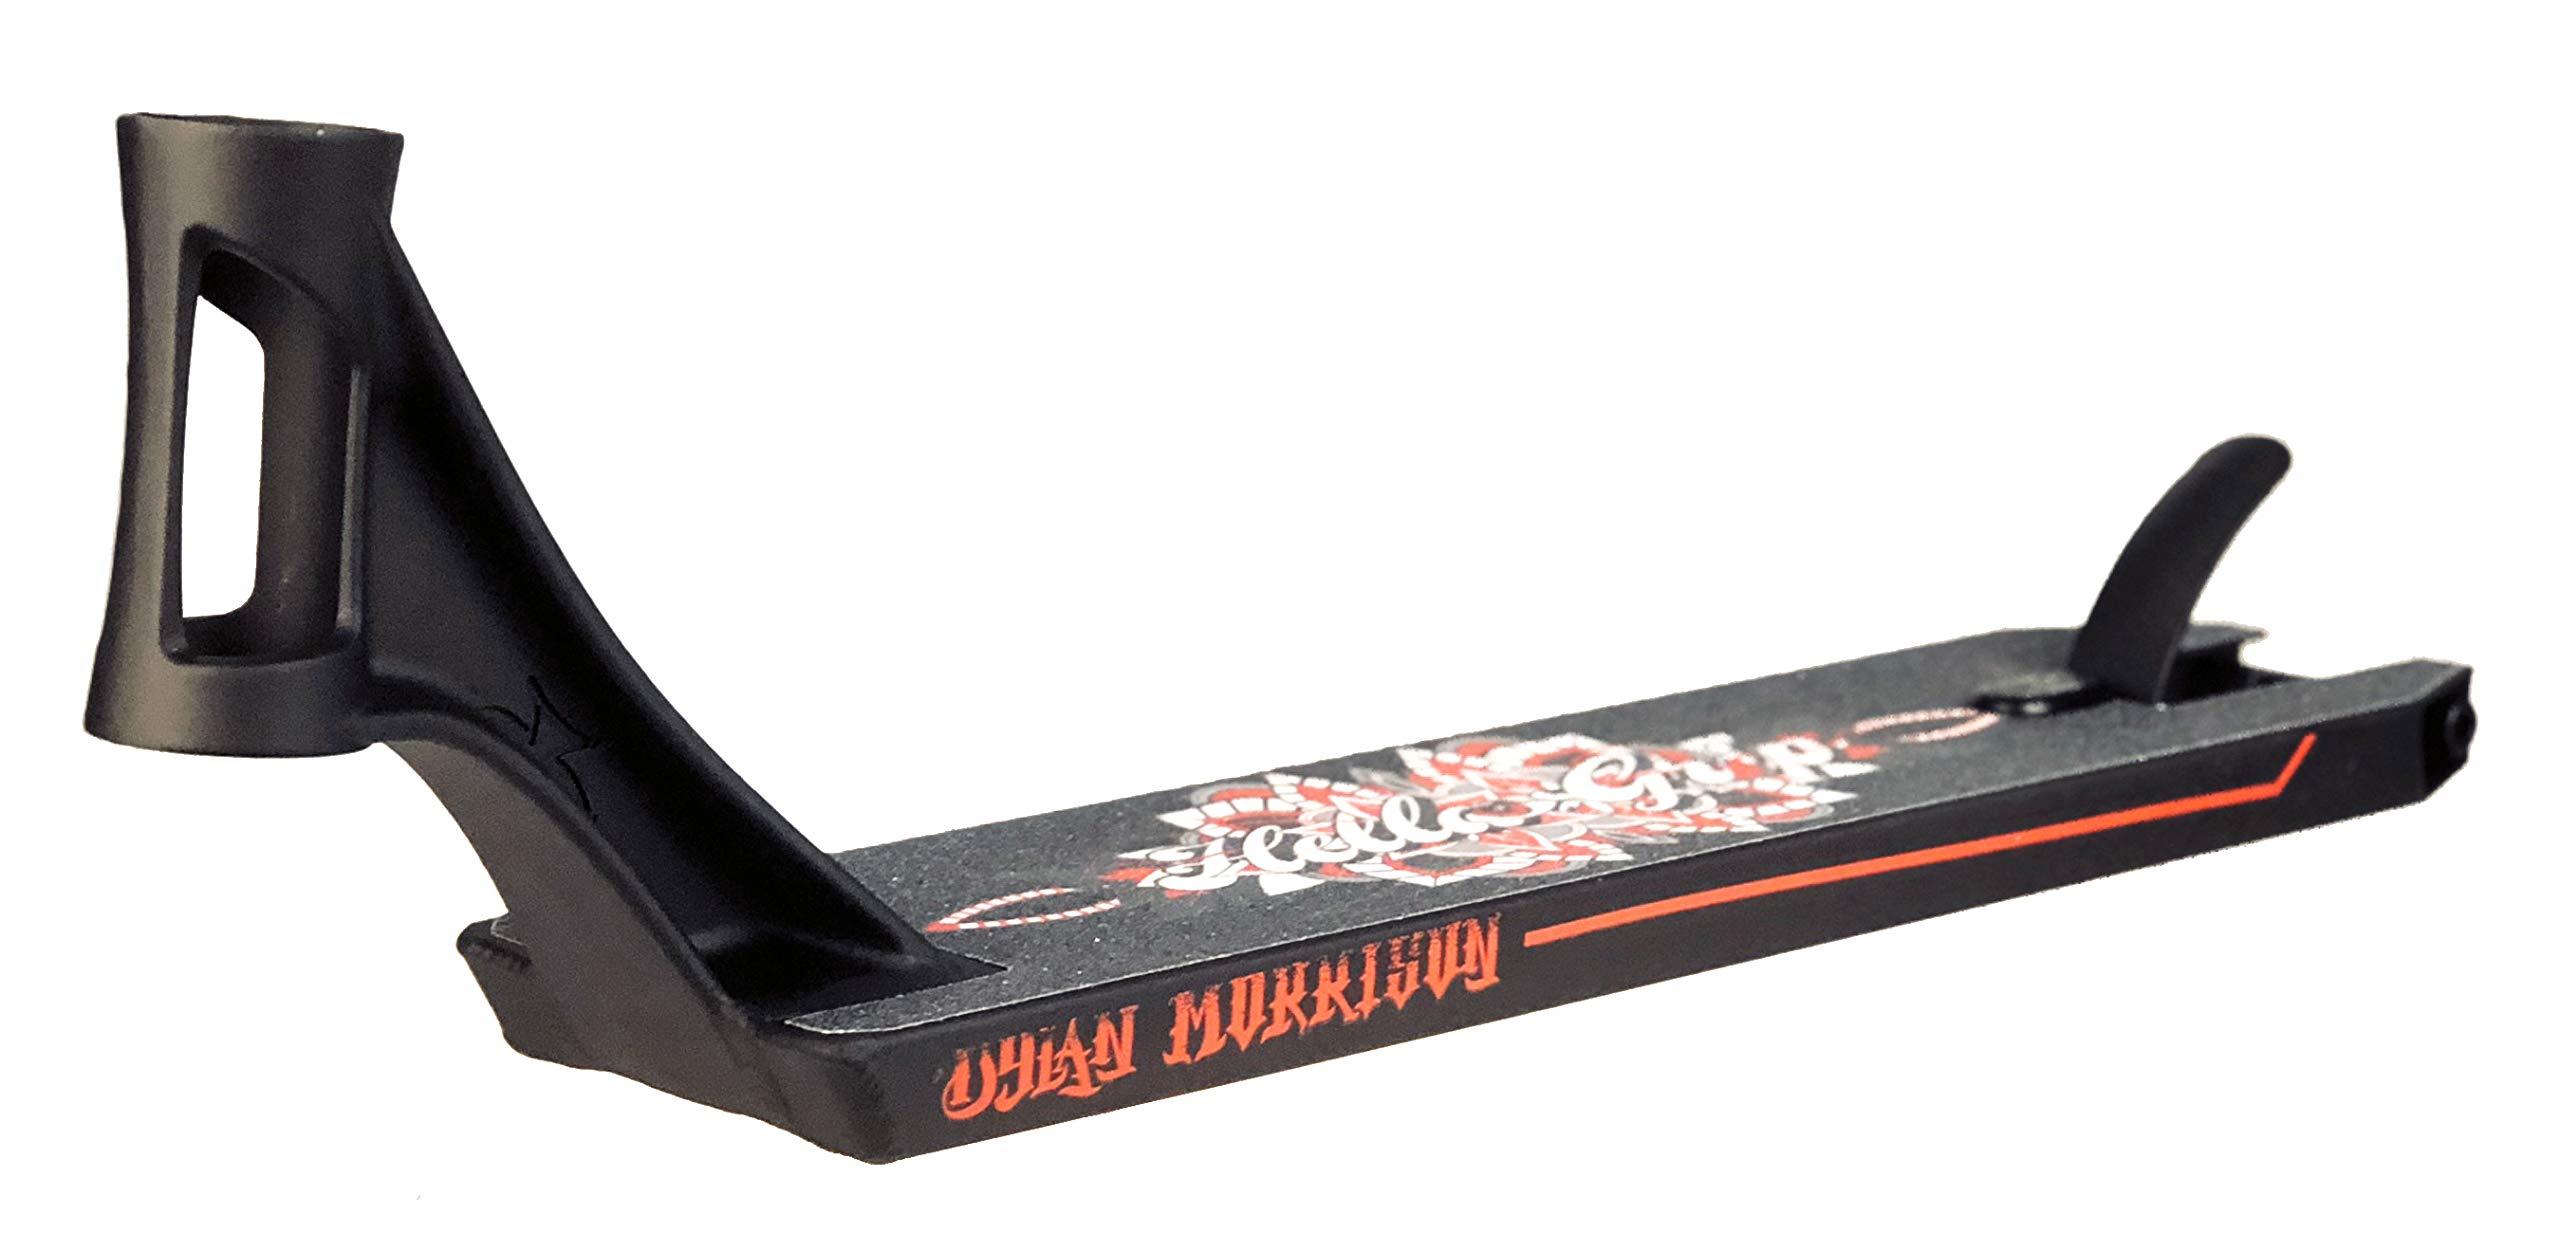 AO Dylan Morrison Signature Scooter Deck Black 19.5